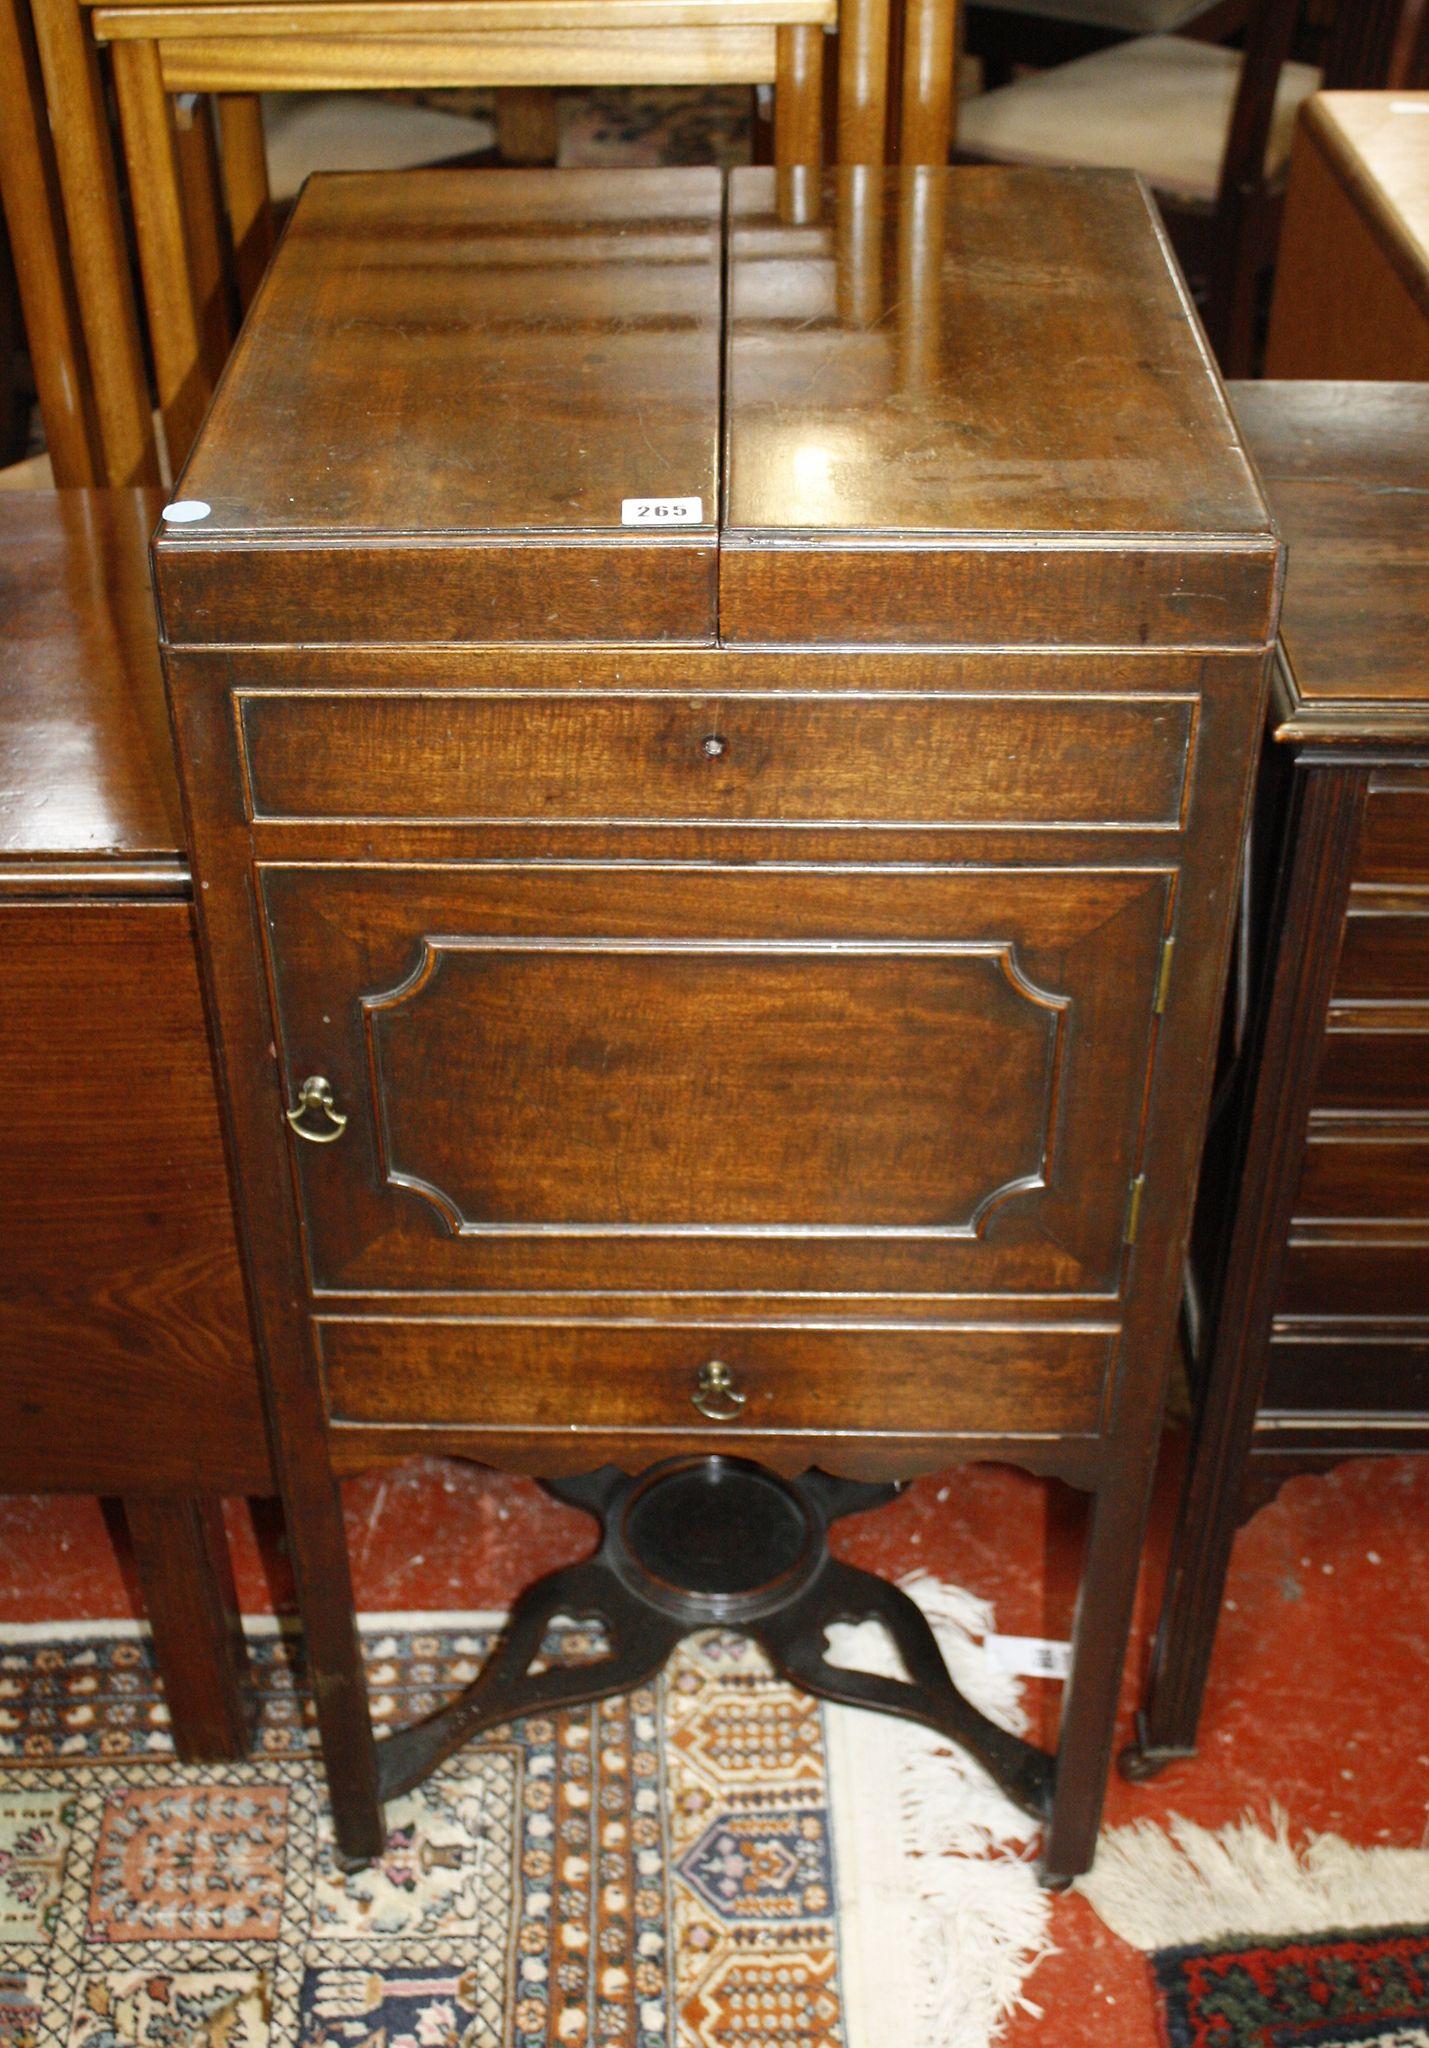 A Regency mahogany enclosed washstand